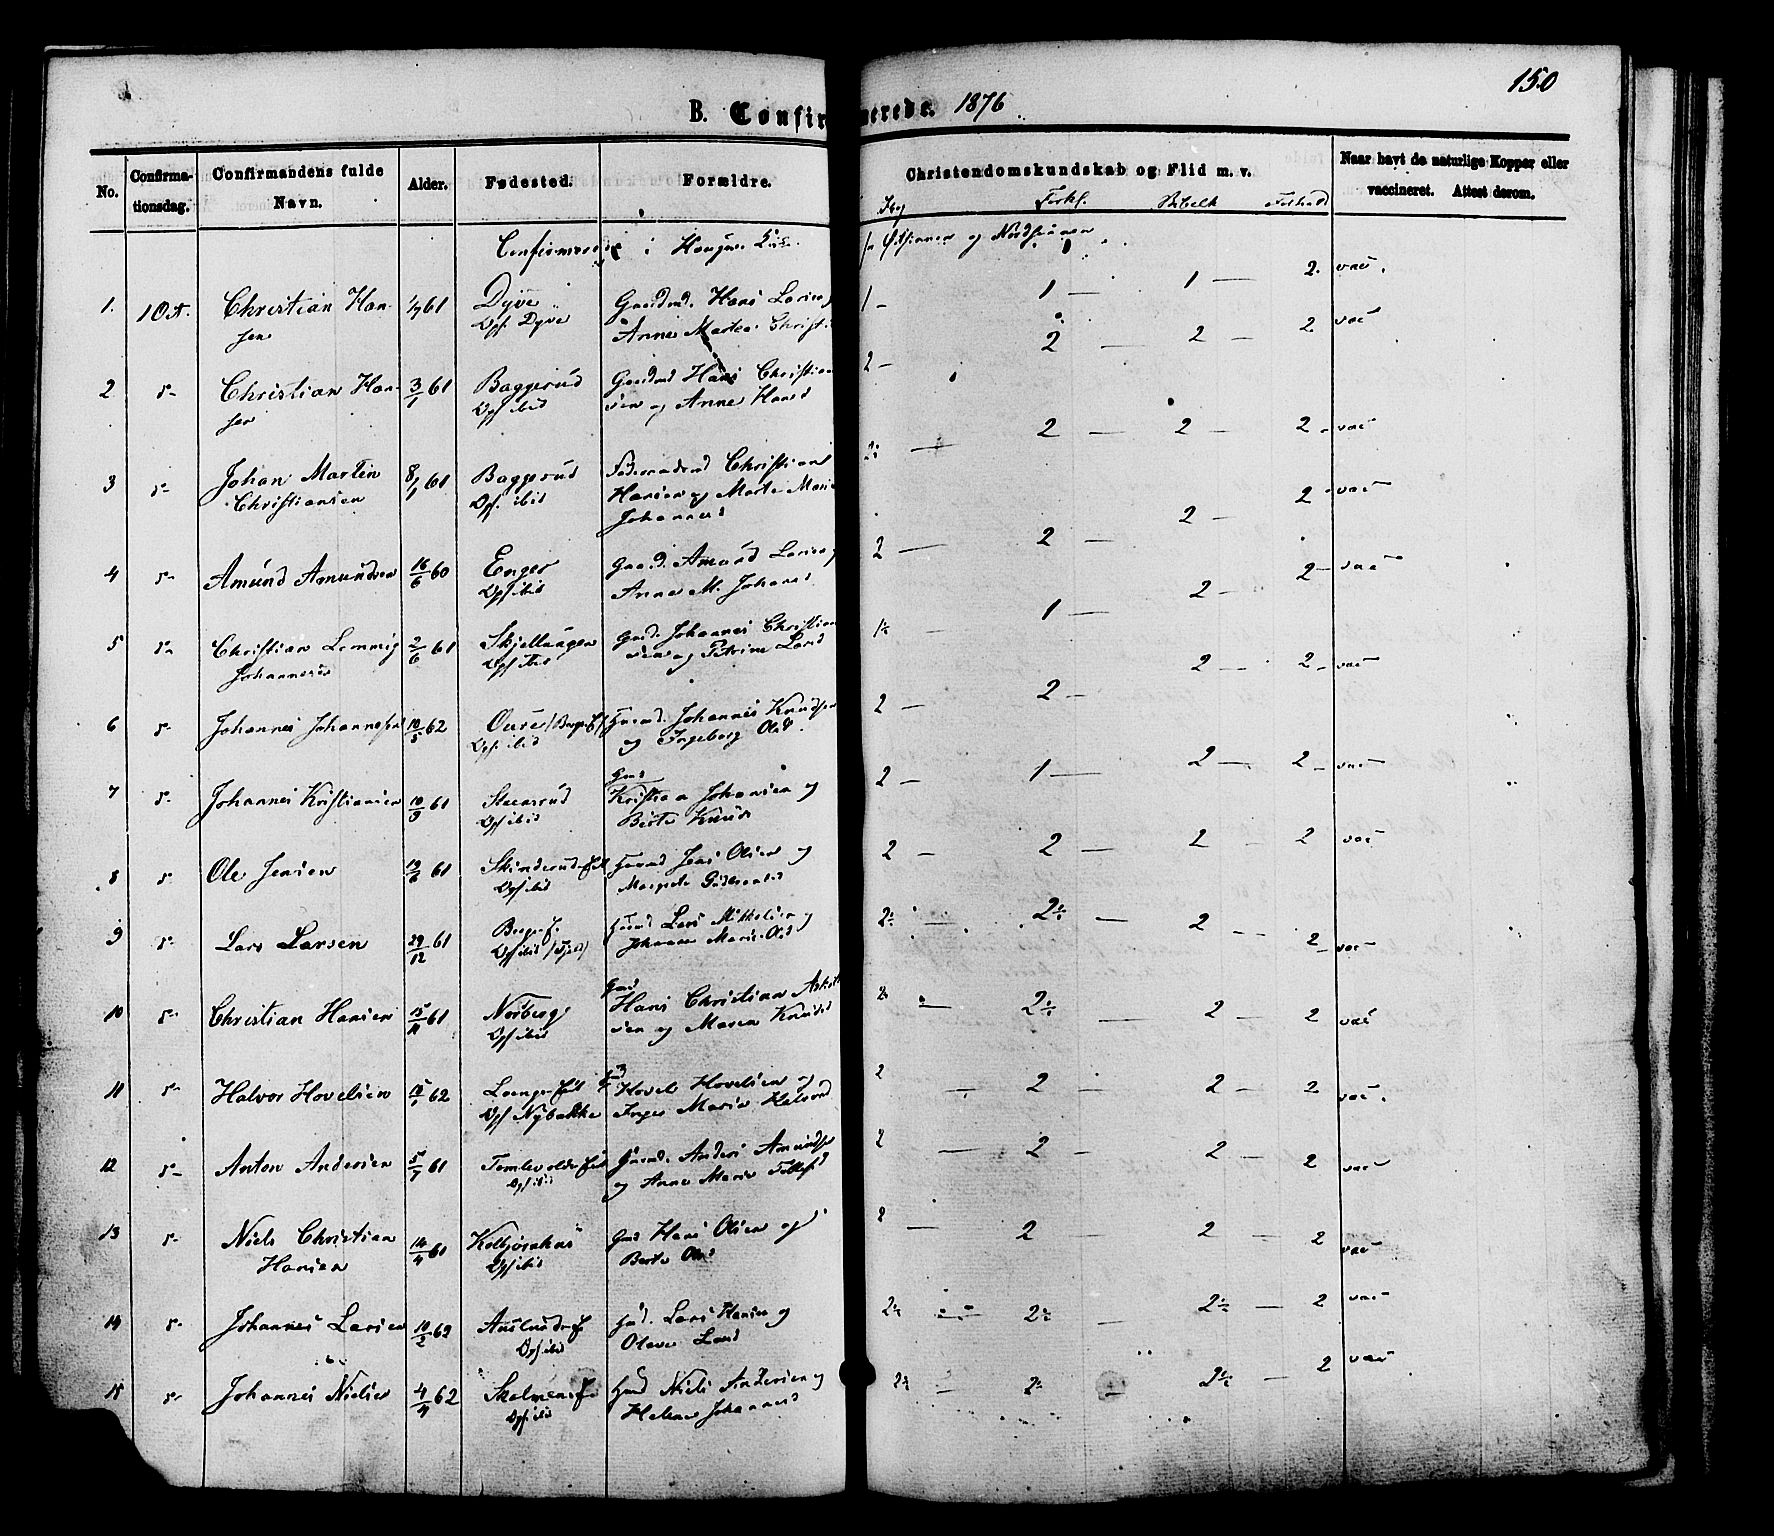 SAH, Nordre Land prestekontor, Ministerialbok nr. 2, 1872-1881, s. 150